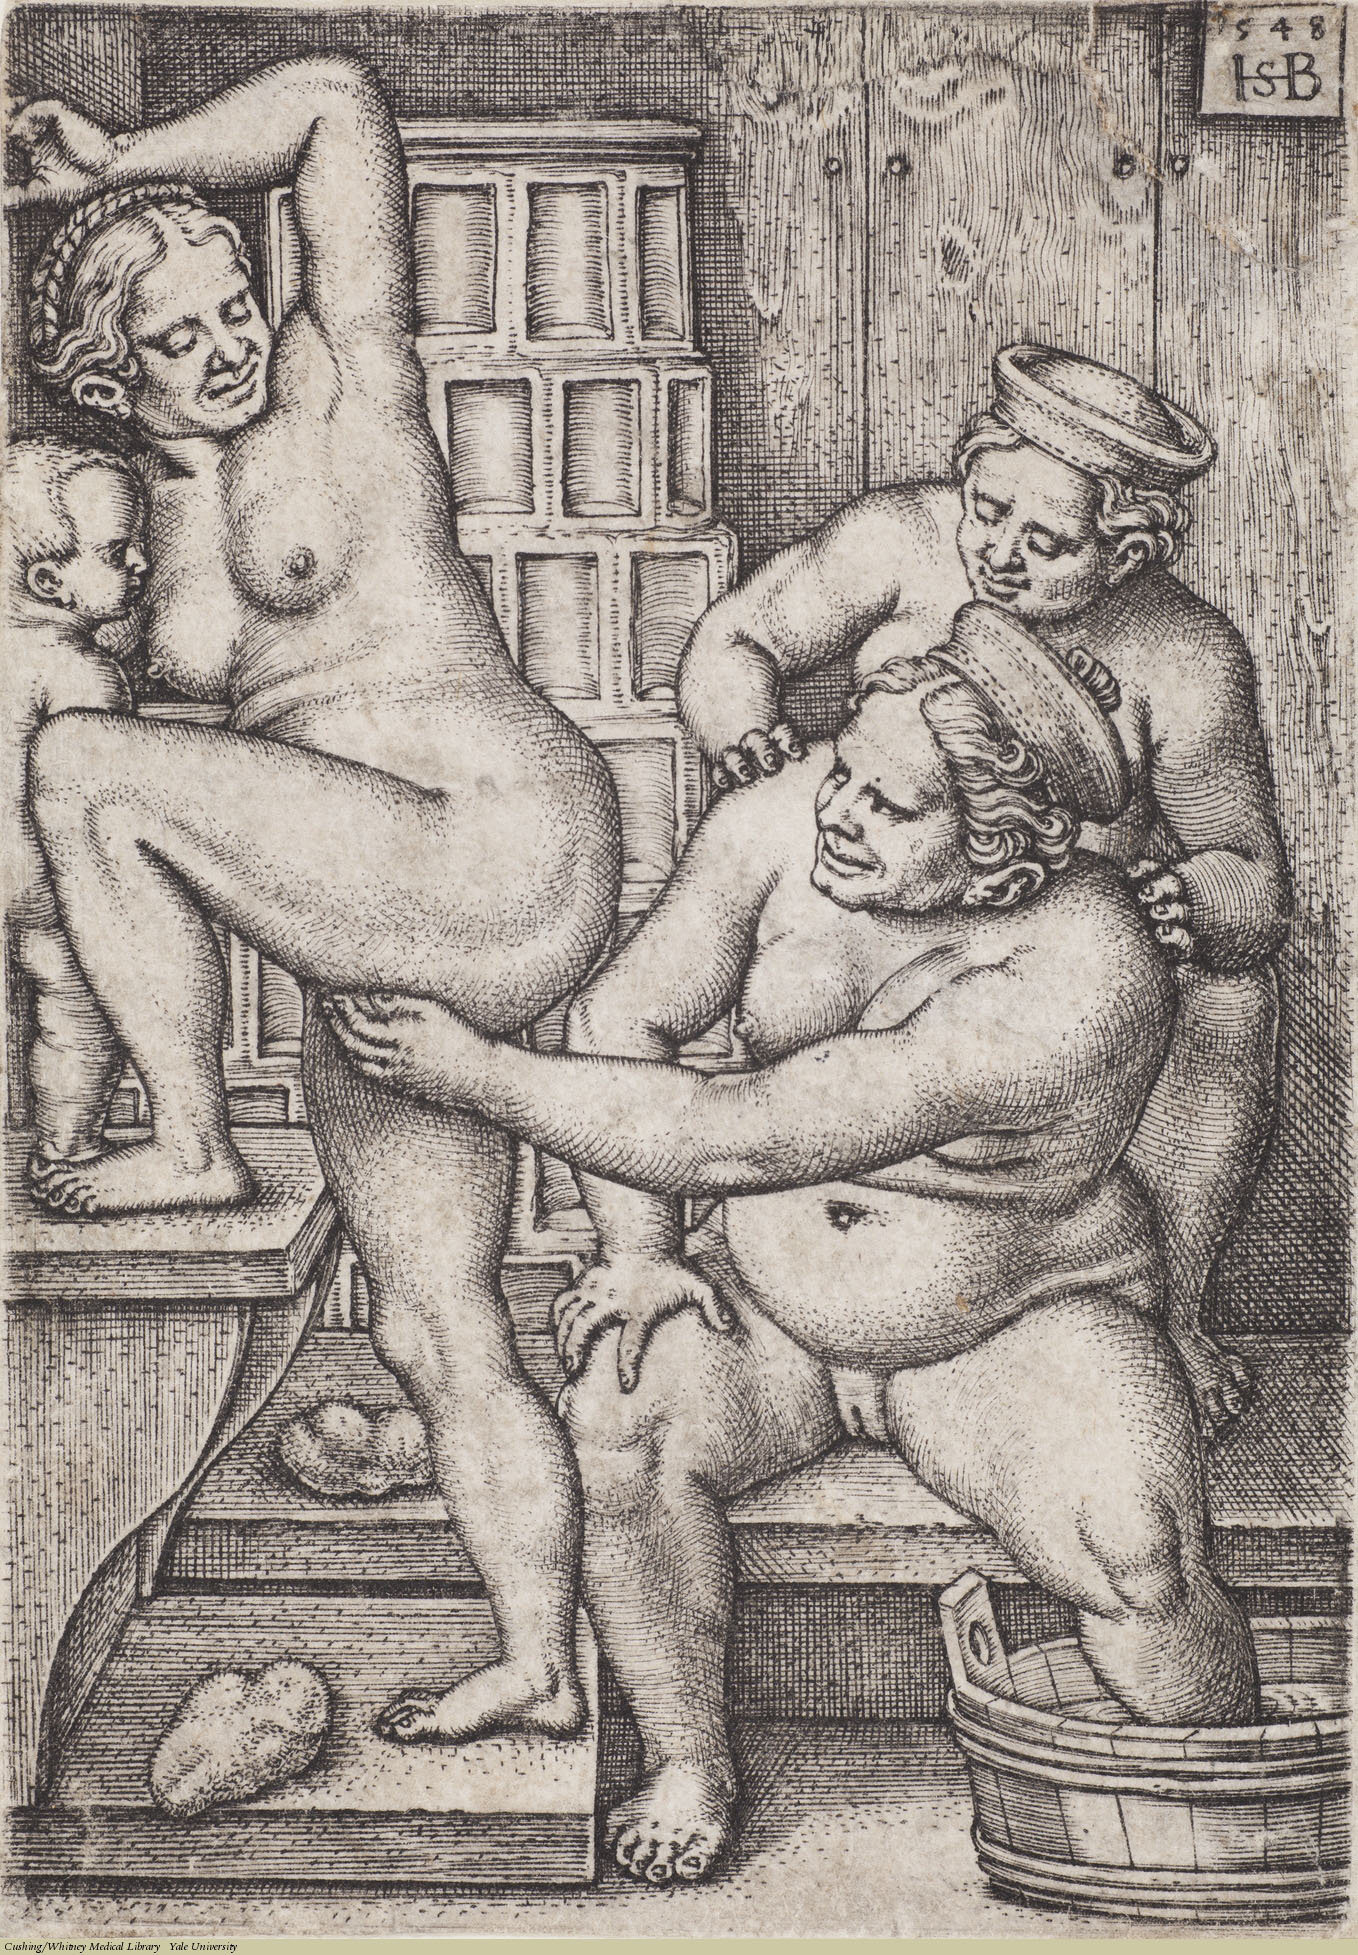 Three Women in the Bath, Hans Sebald Beham, Engraving, 1548. Subject: Public Baths, Sexual Behaviour.